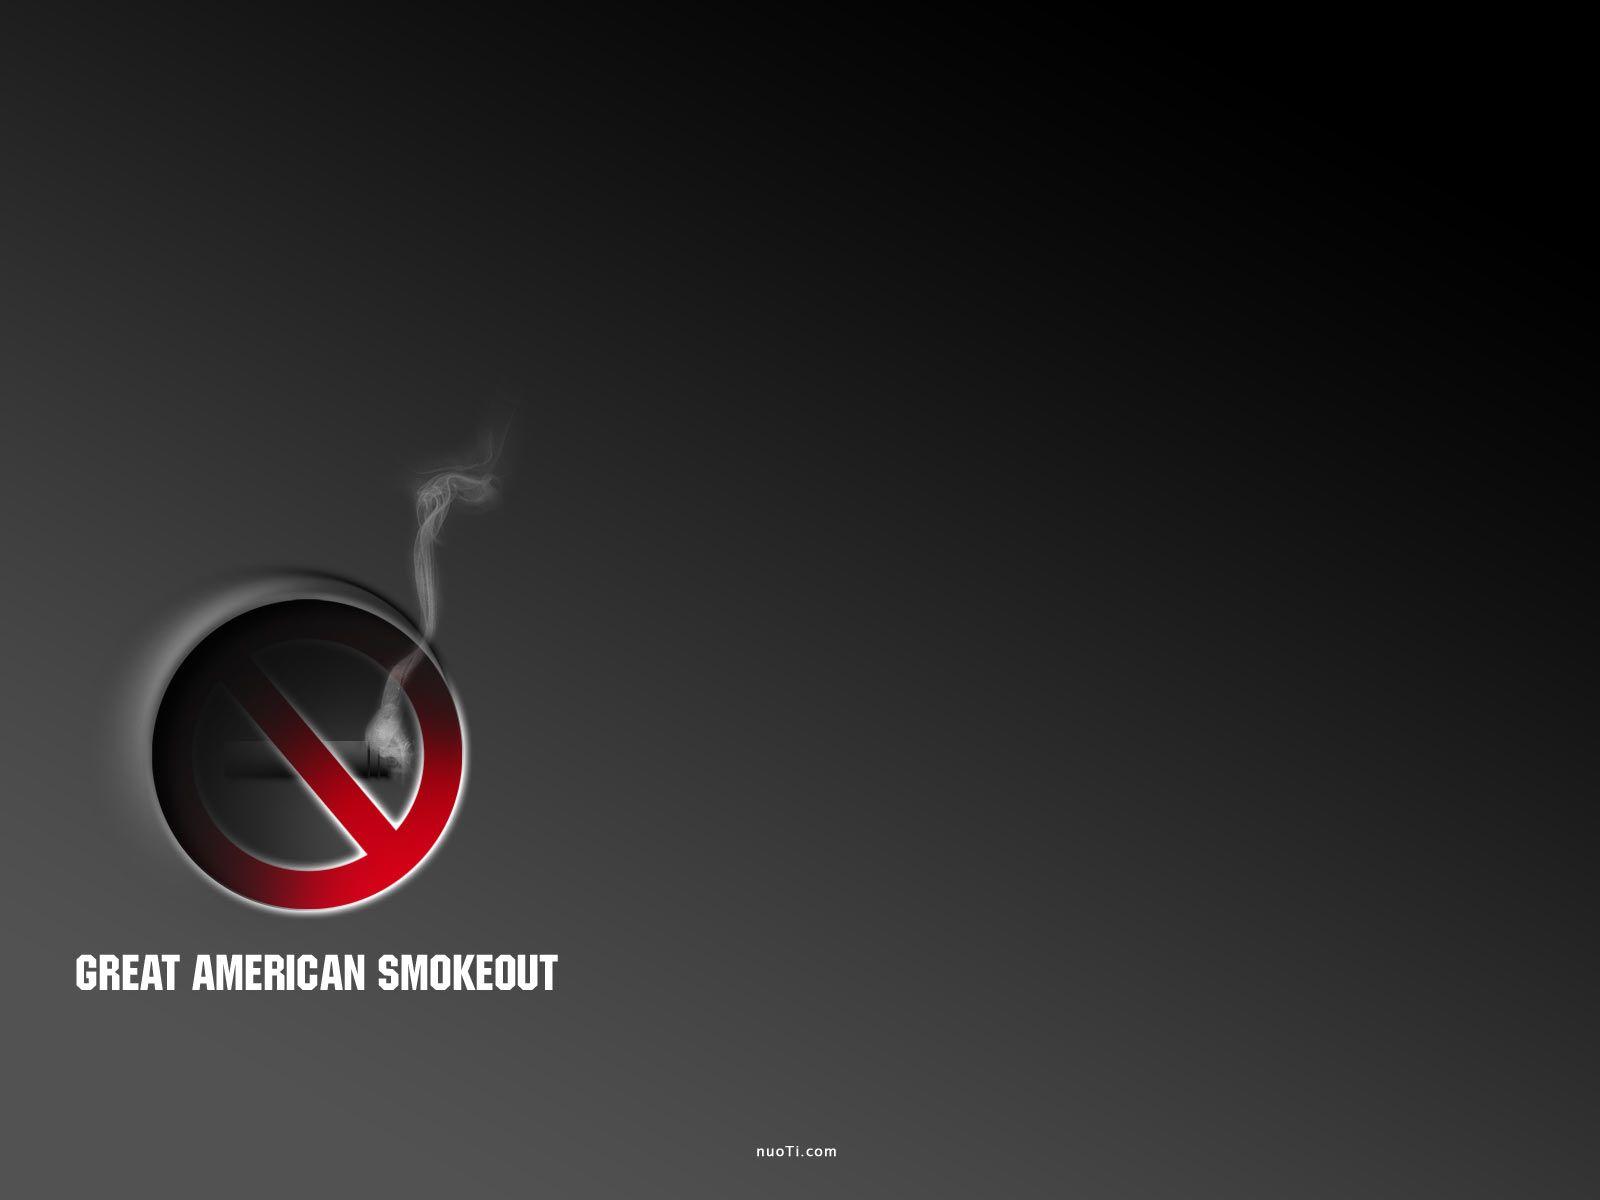 No Smoking Wallpapers 1600x1200